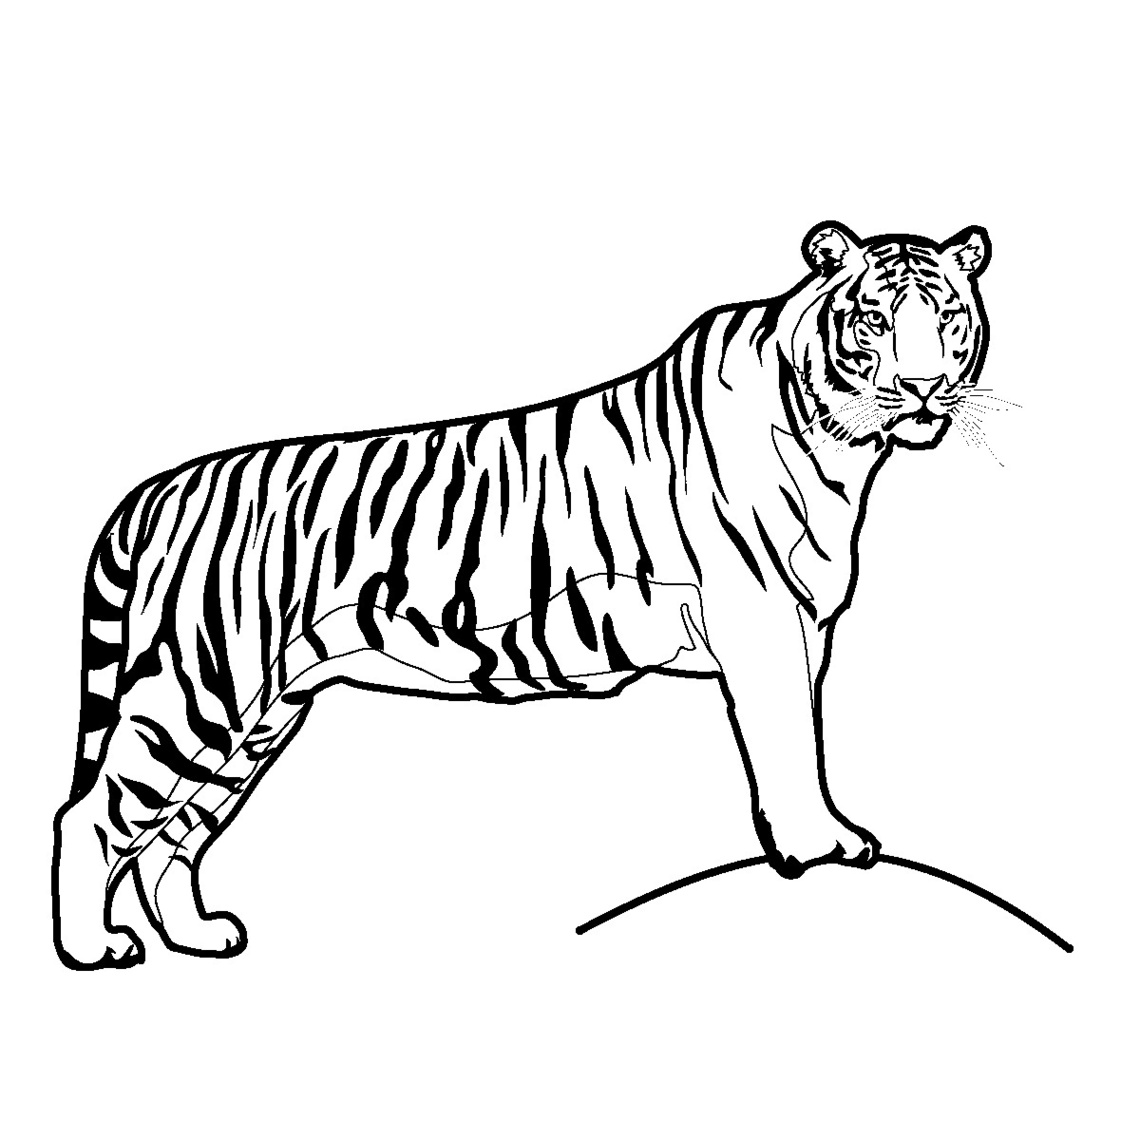 Tiger 1 color clipart picture transparent download Tiger 1 color clipart - ClipartFest picture transparent download